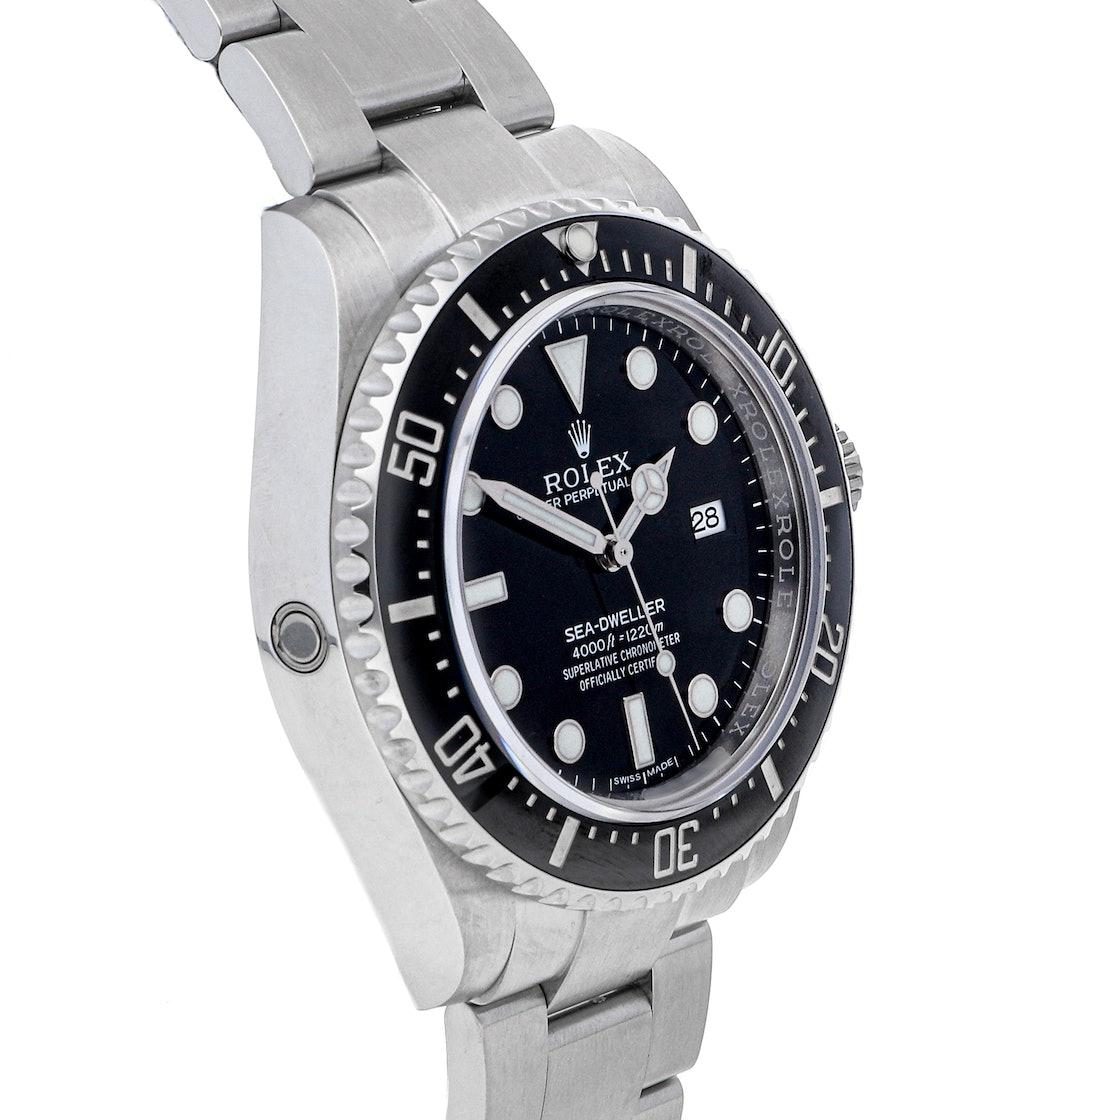 Rolex Sea-Dweller 4000 116600